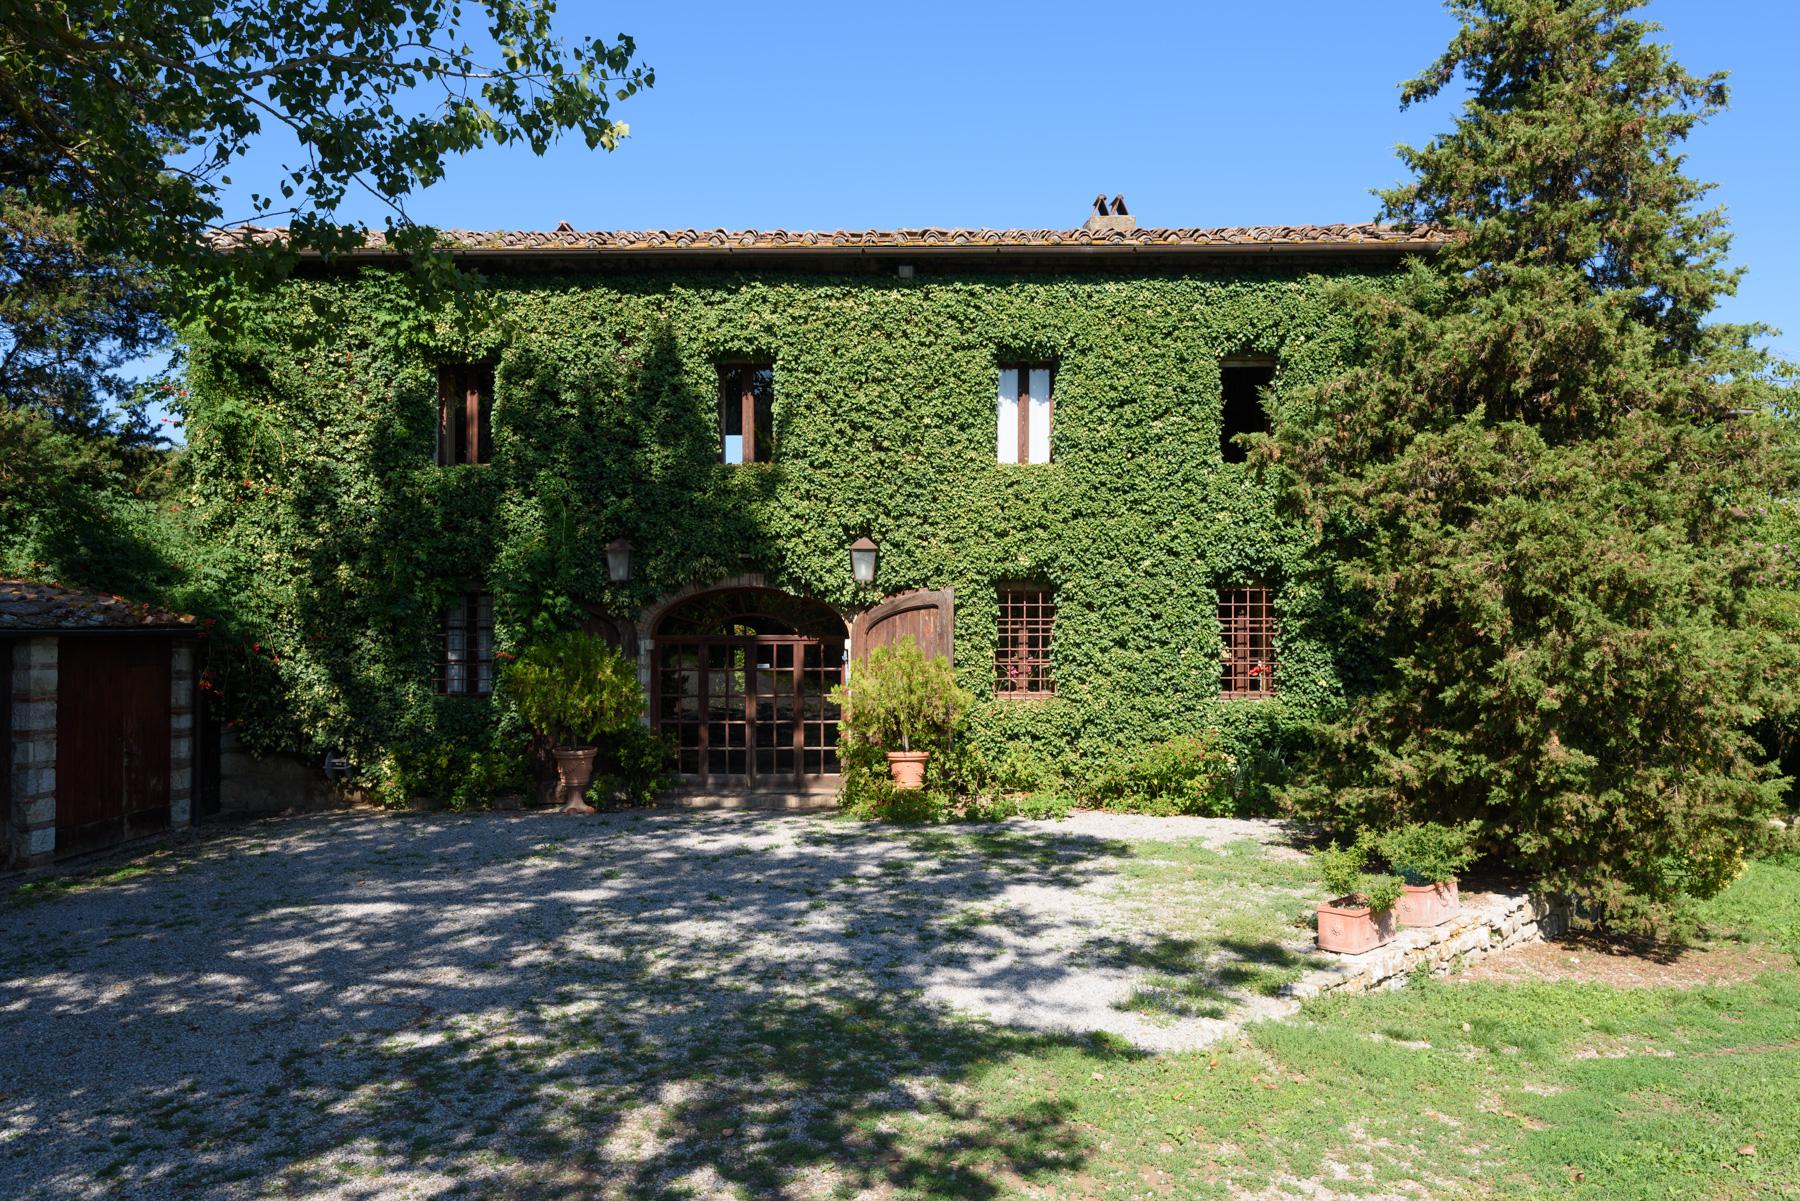 Casa para uma família para Venda às Chianti Country Estate with vineyard Loc. Lo Spicchio Radda In Chianti, Siena 53017 Itália